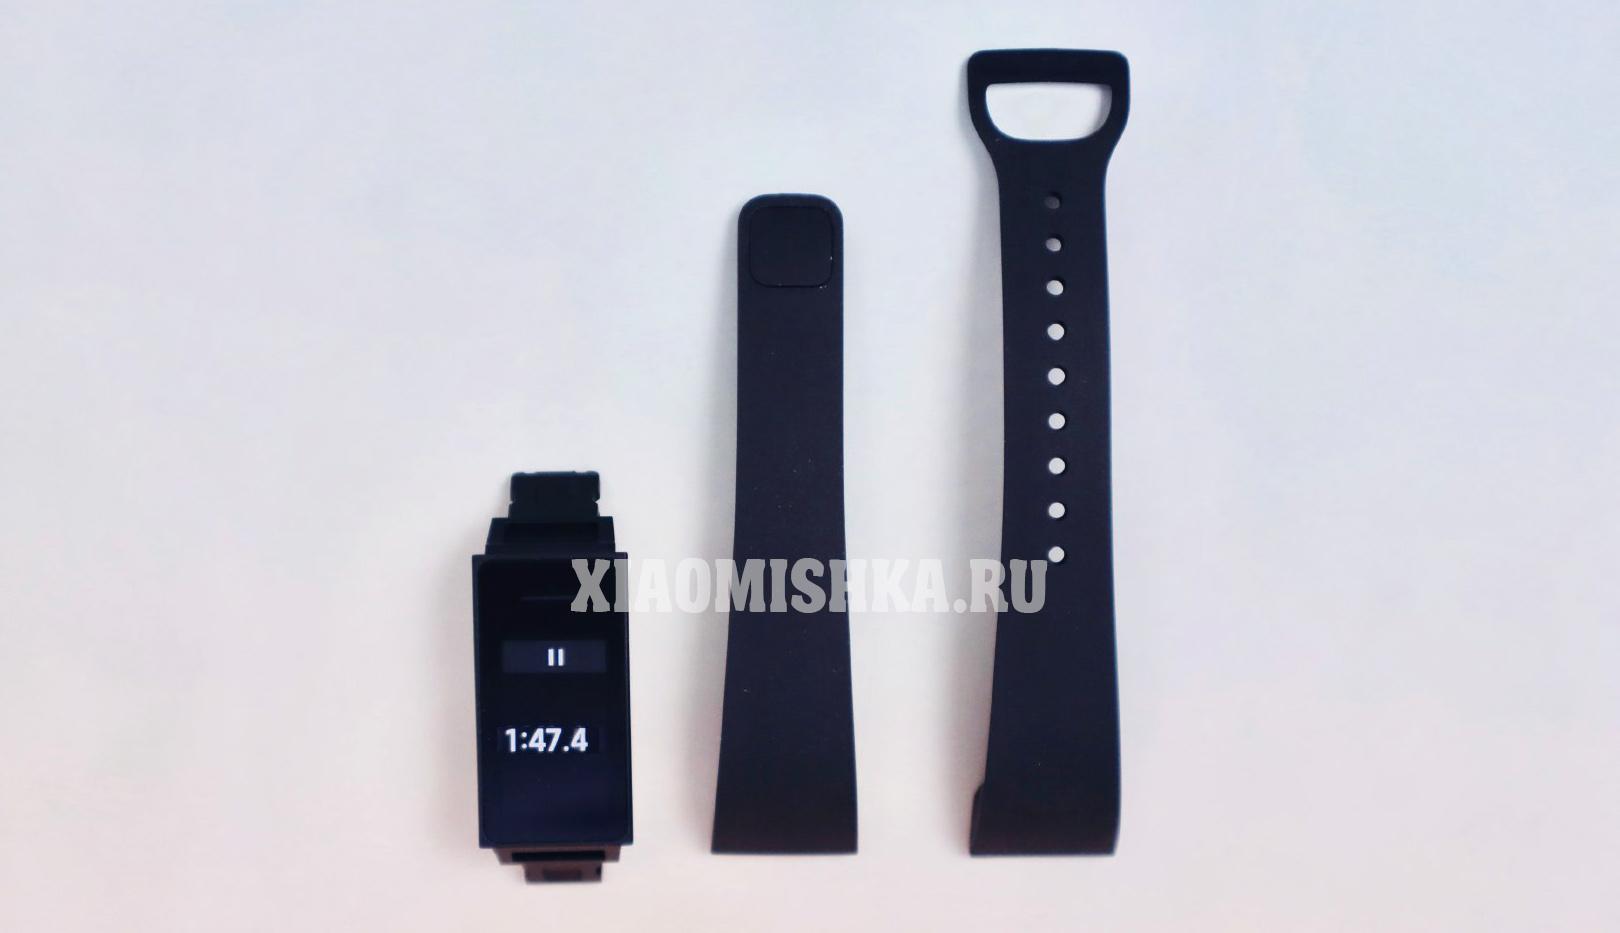 Xiaomi Mi Band 4C fitness band